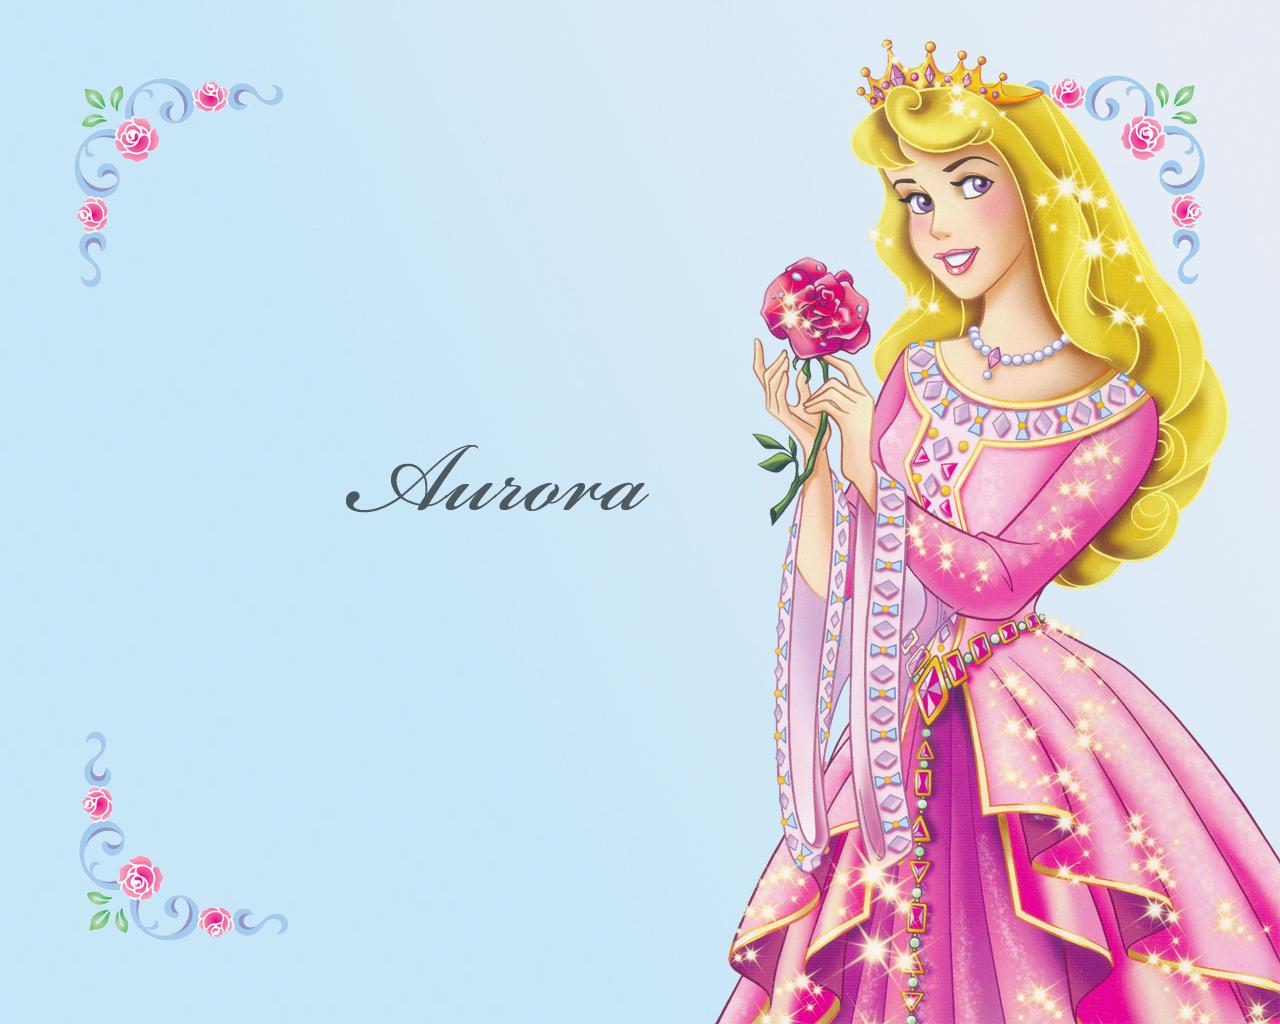 Disney princess aurora